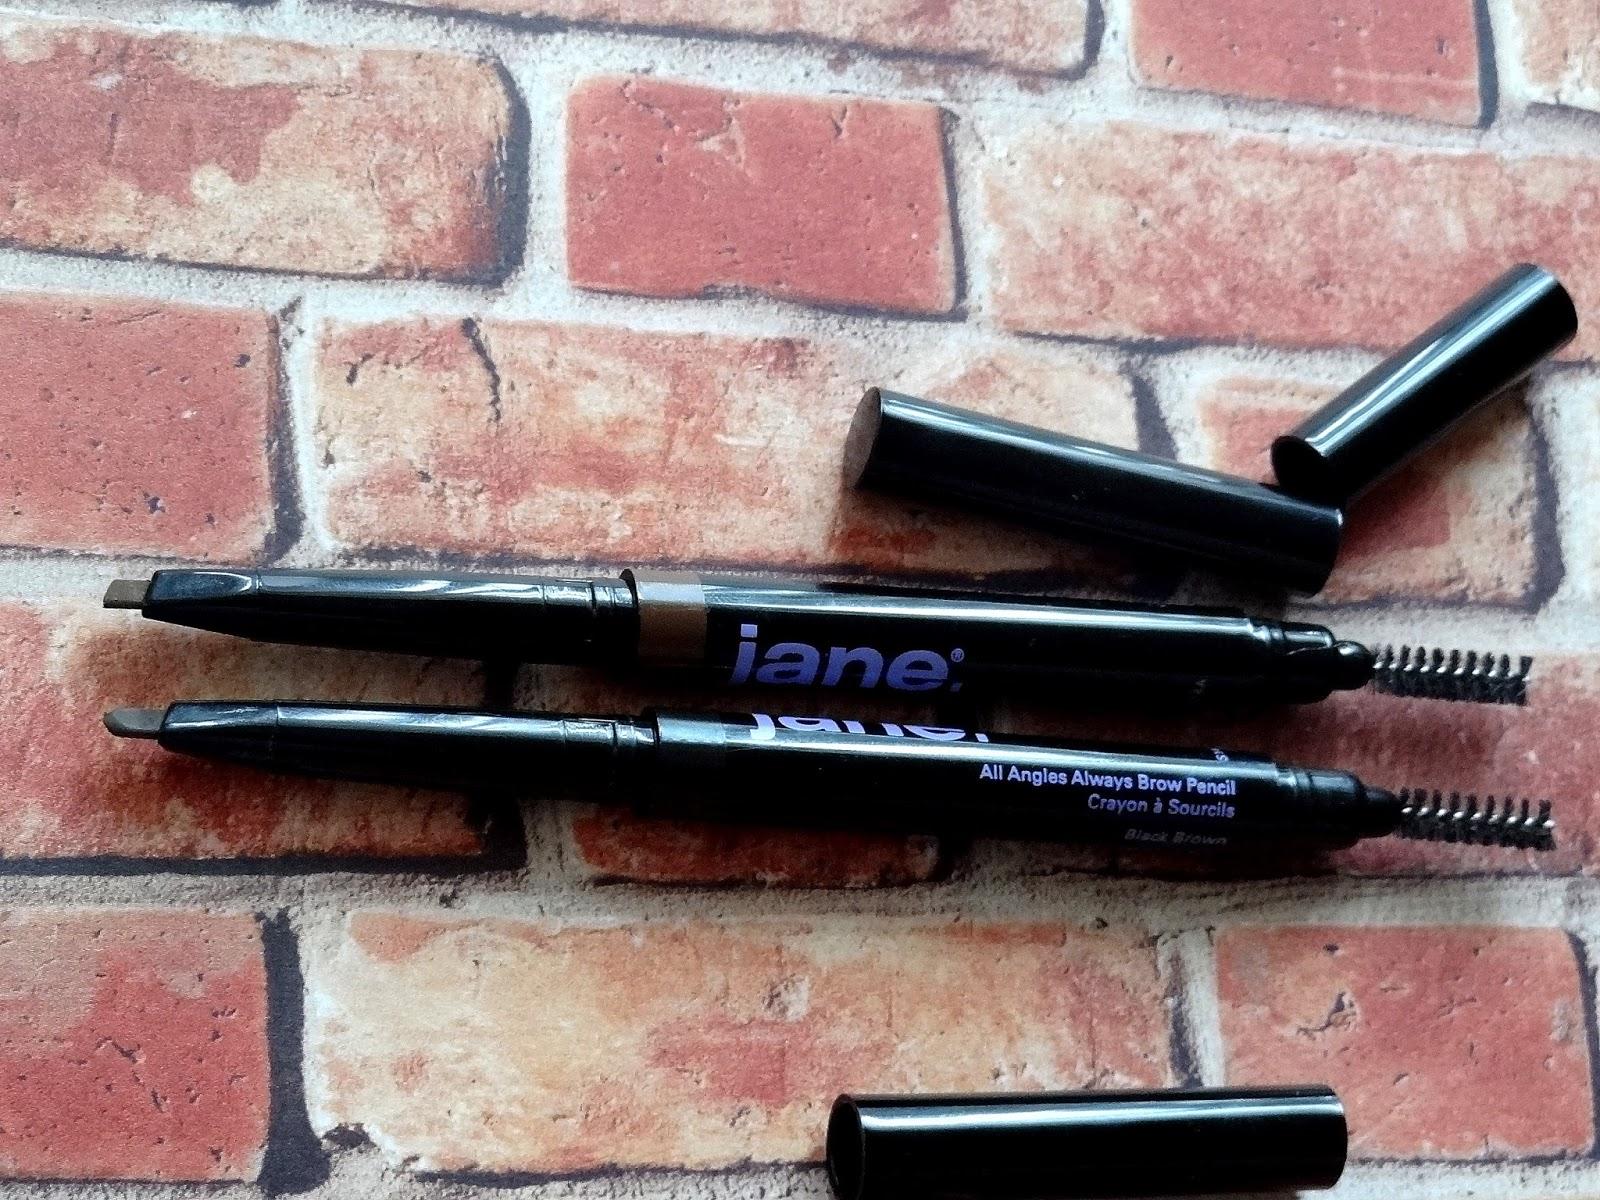 JaneCosmetics All Angles Always Brow Pencils